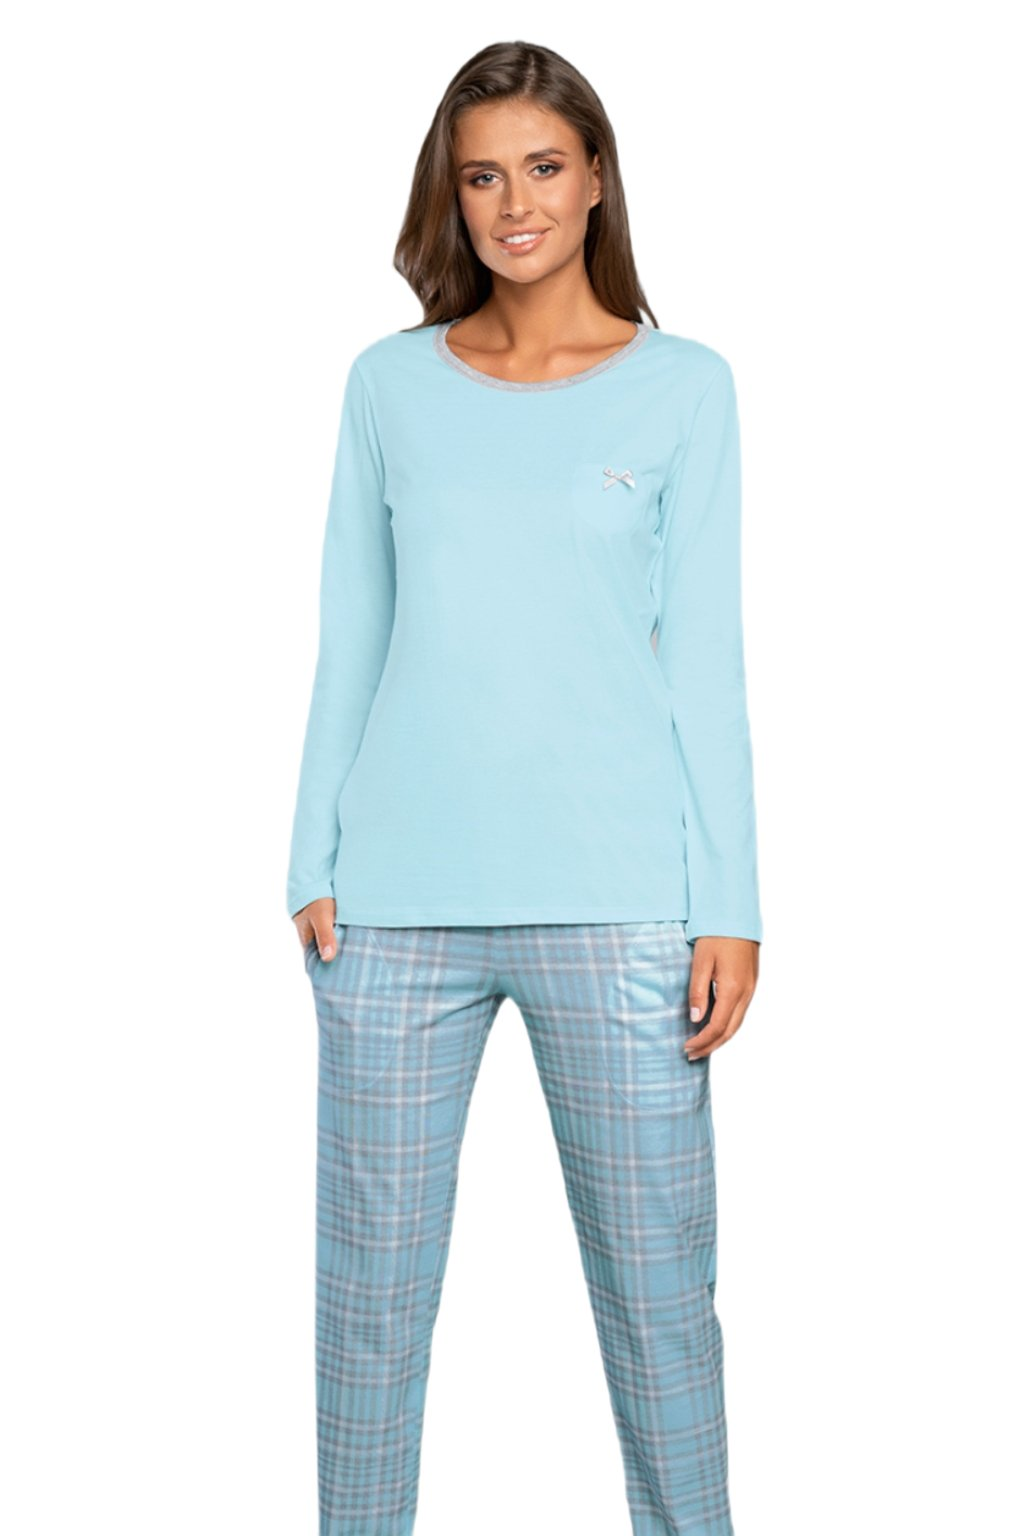 Dámské pyžamo s dlouhým rukávem Italian Fashion Mitali